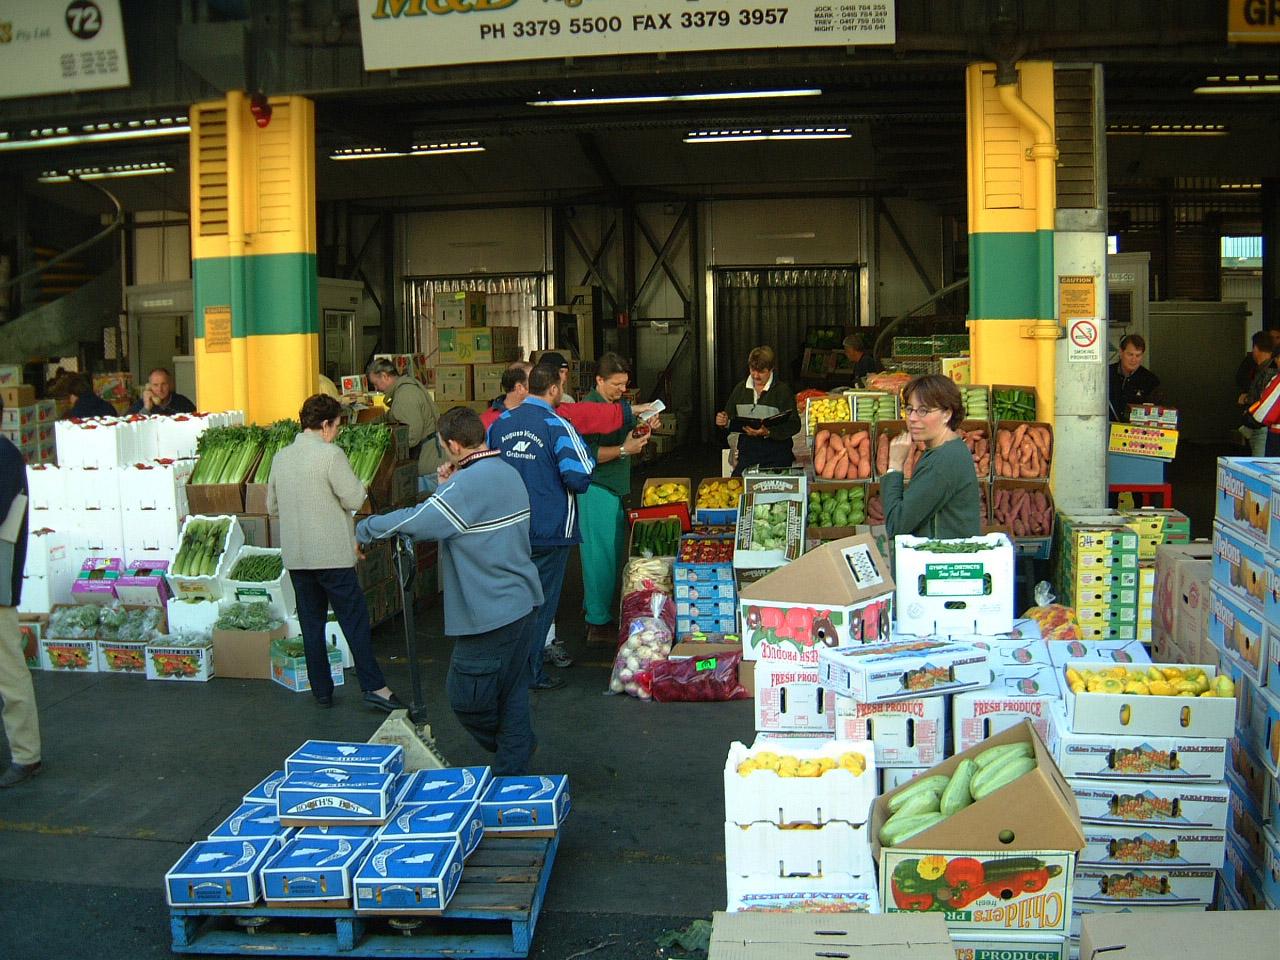 Brisbane Markets Sherwood Road Rocklea Queensland 4106 Jun 2002 I10